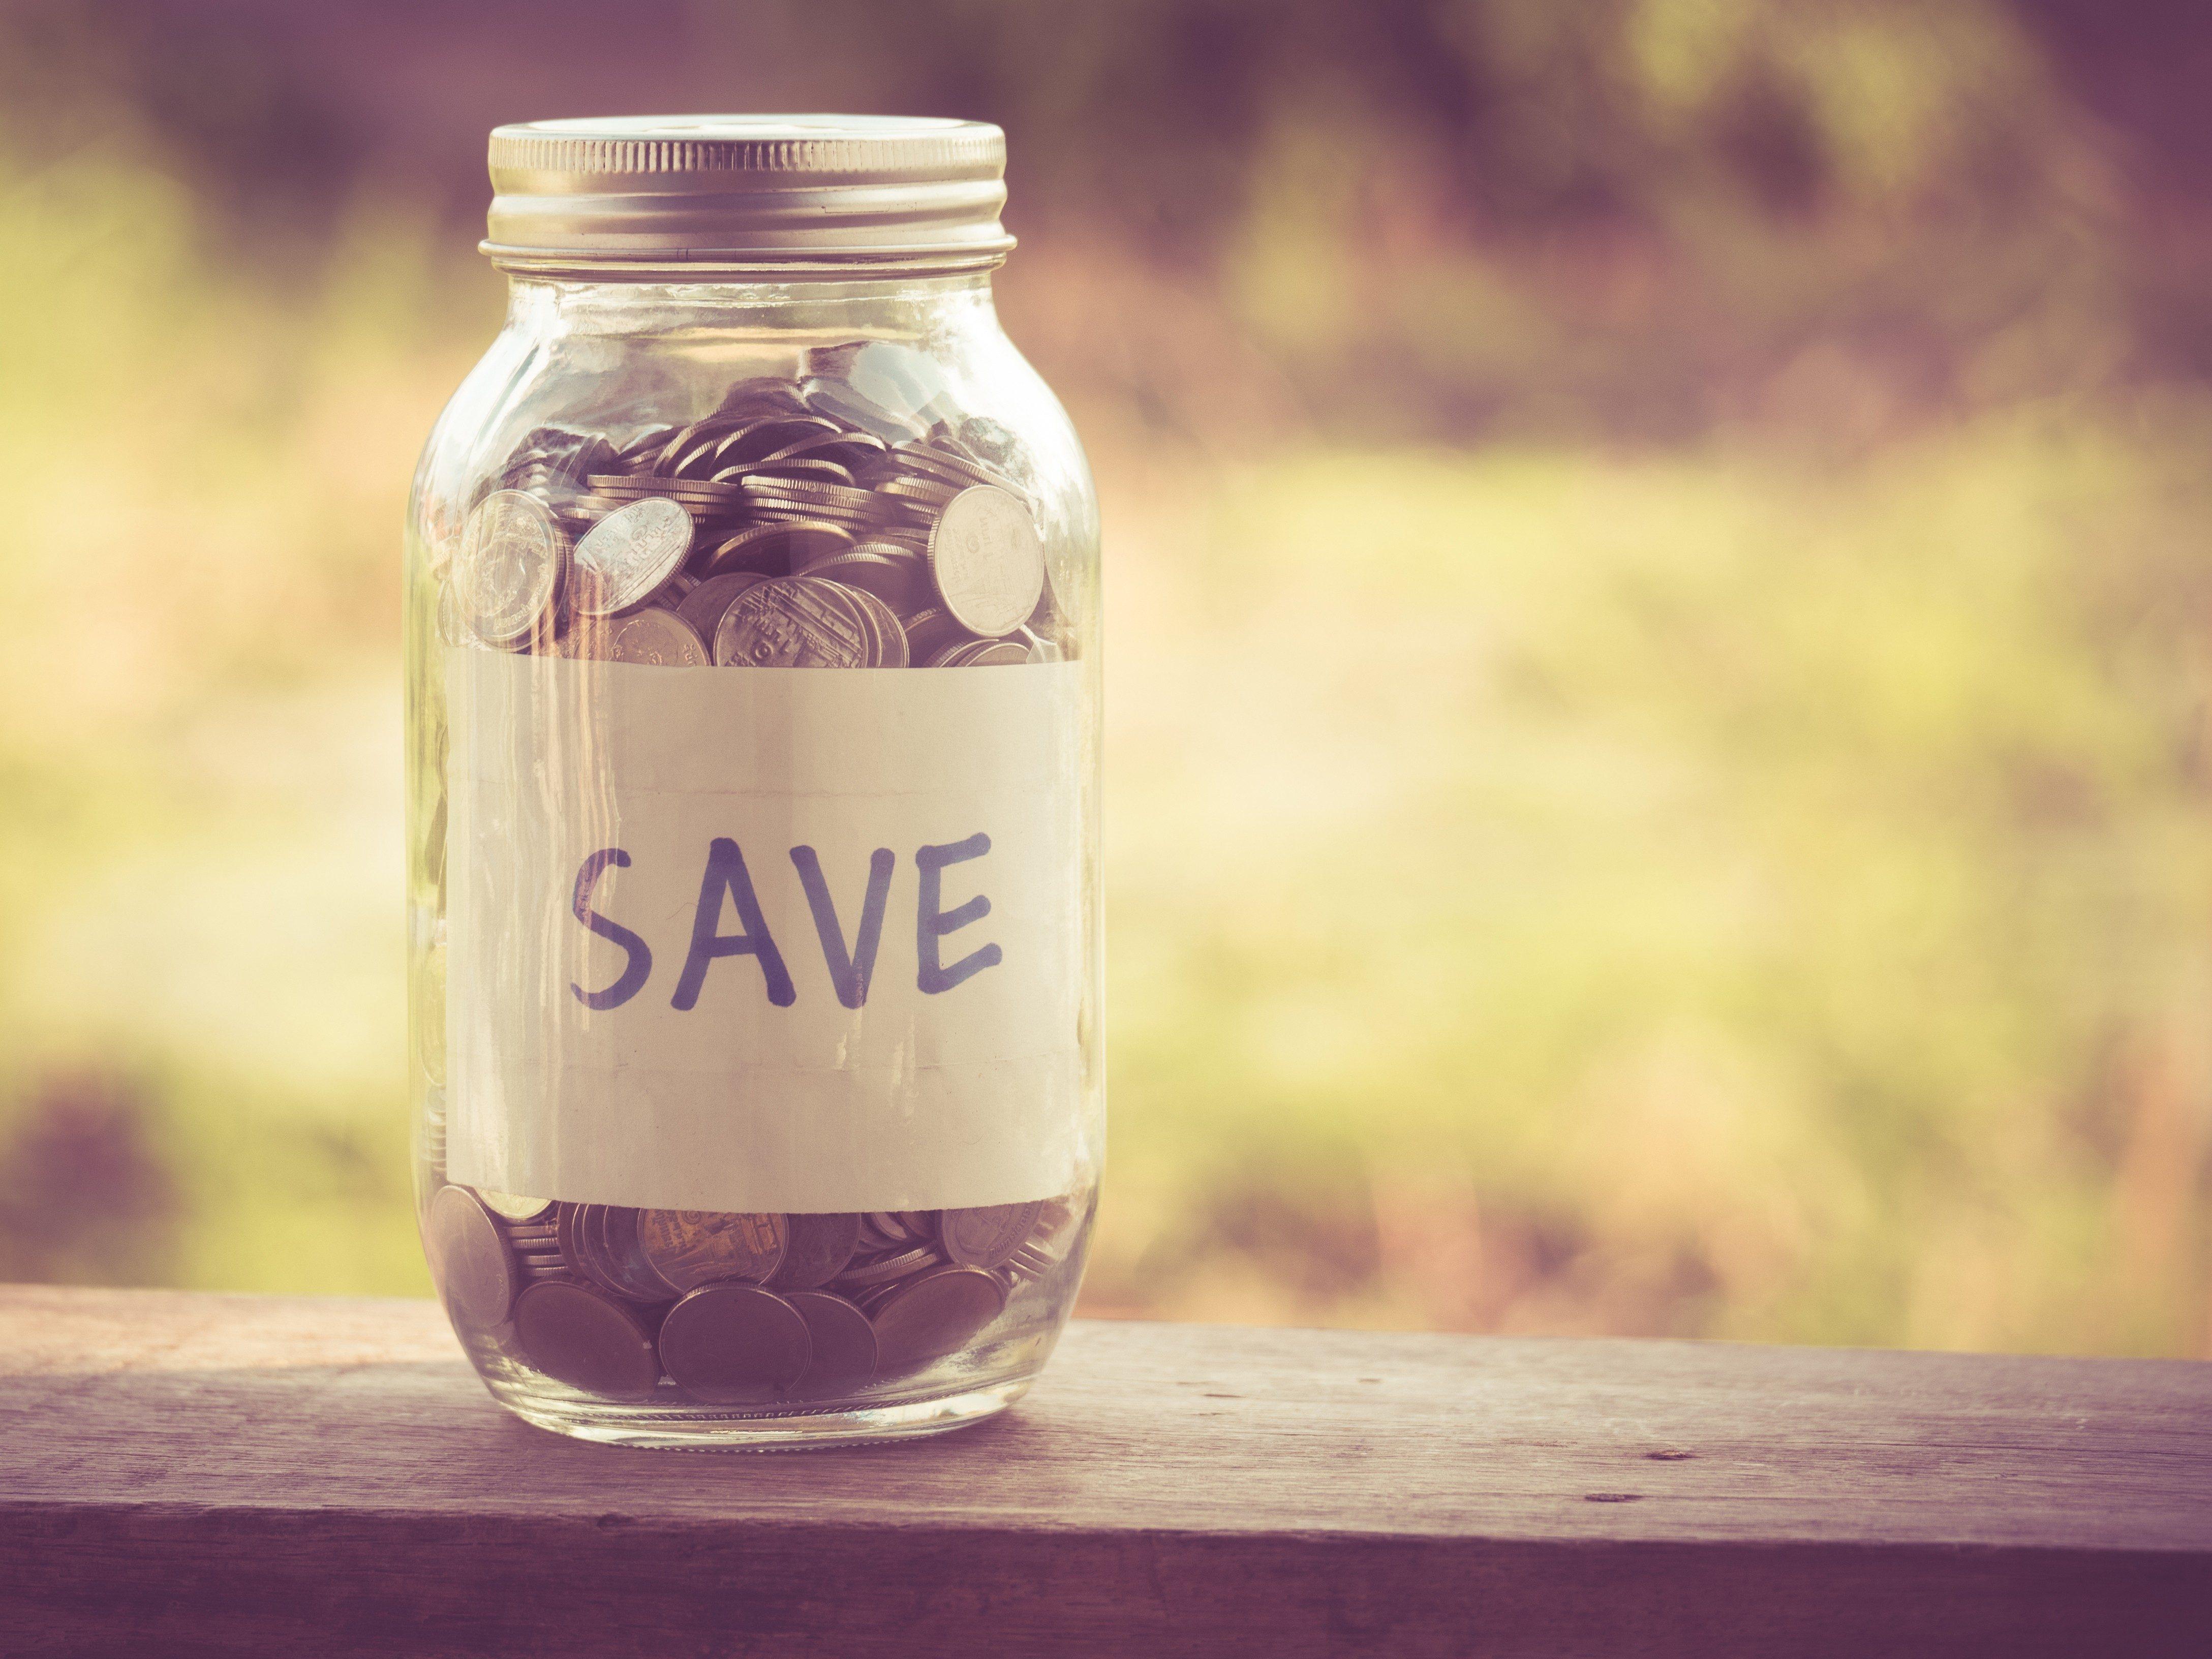 Managing money in your 50s